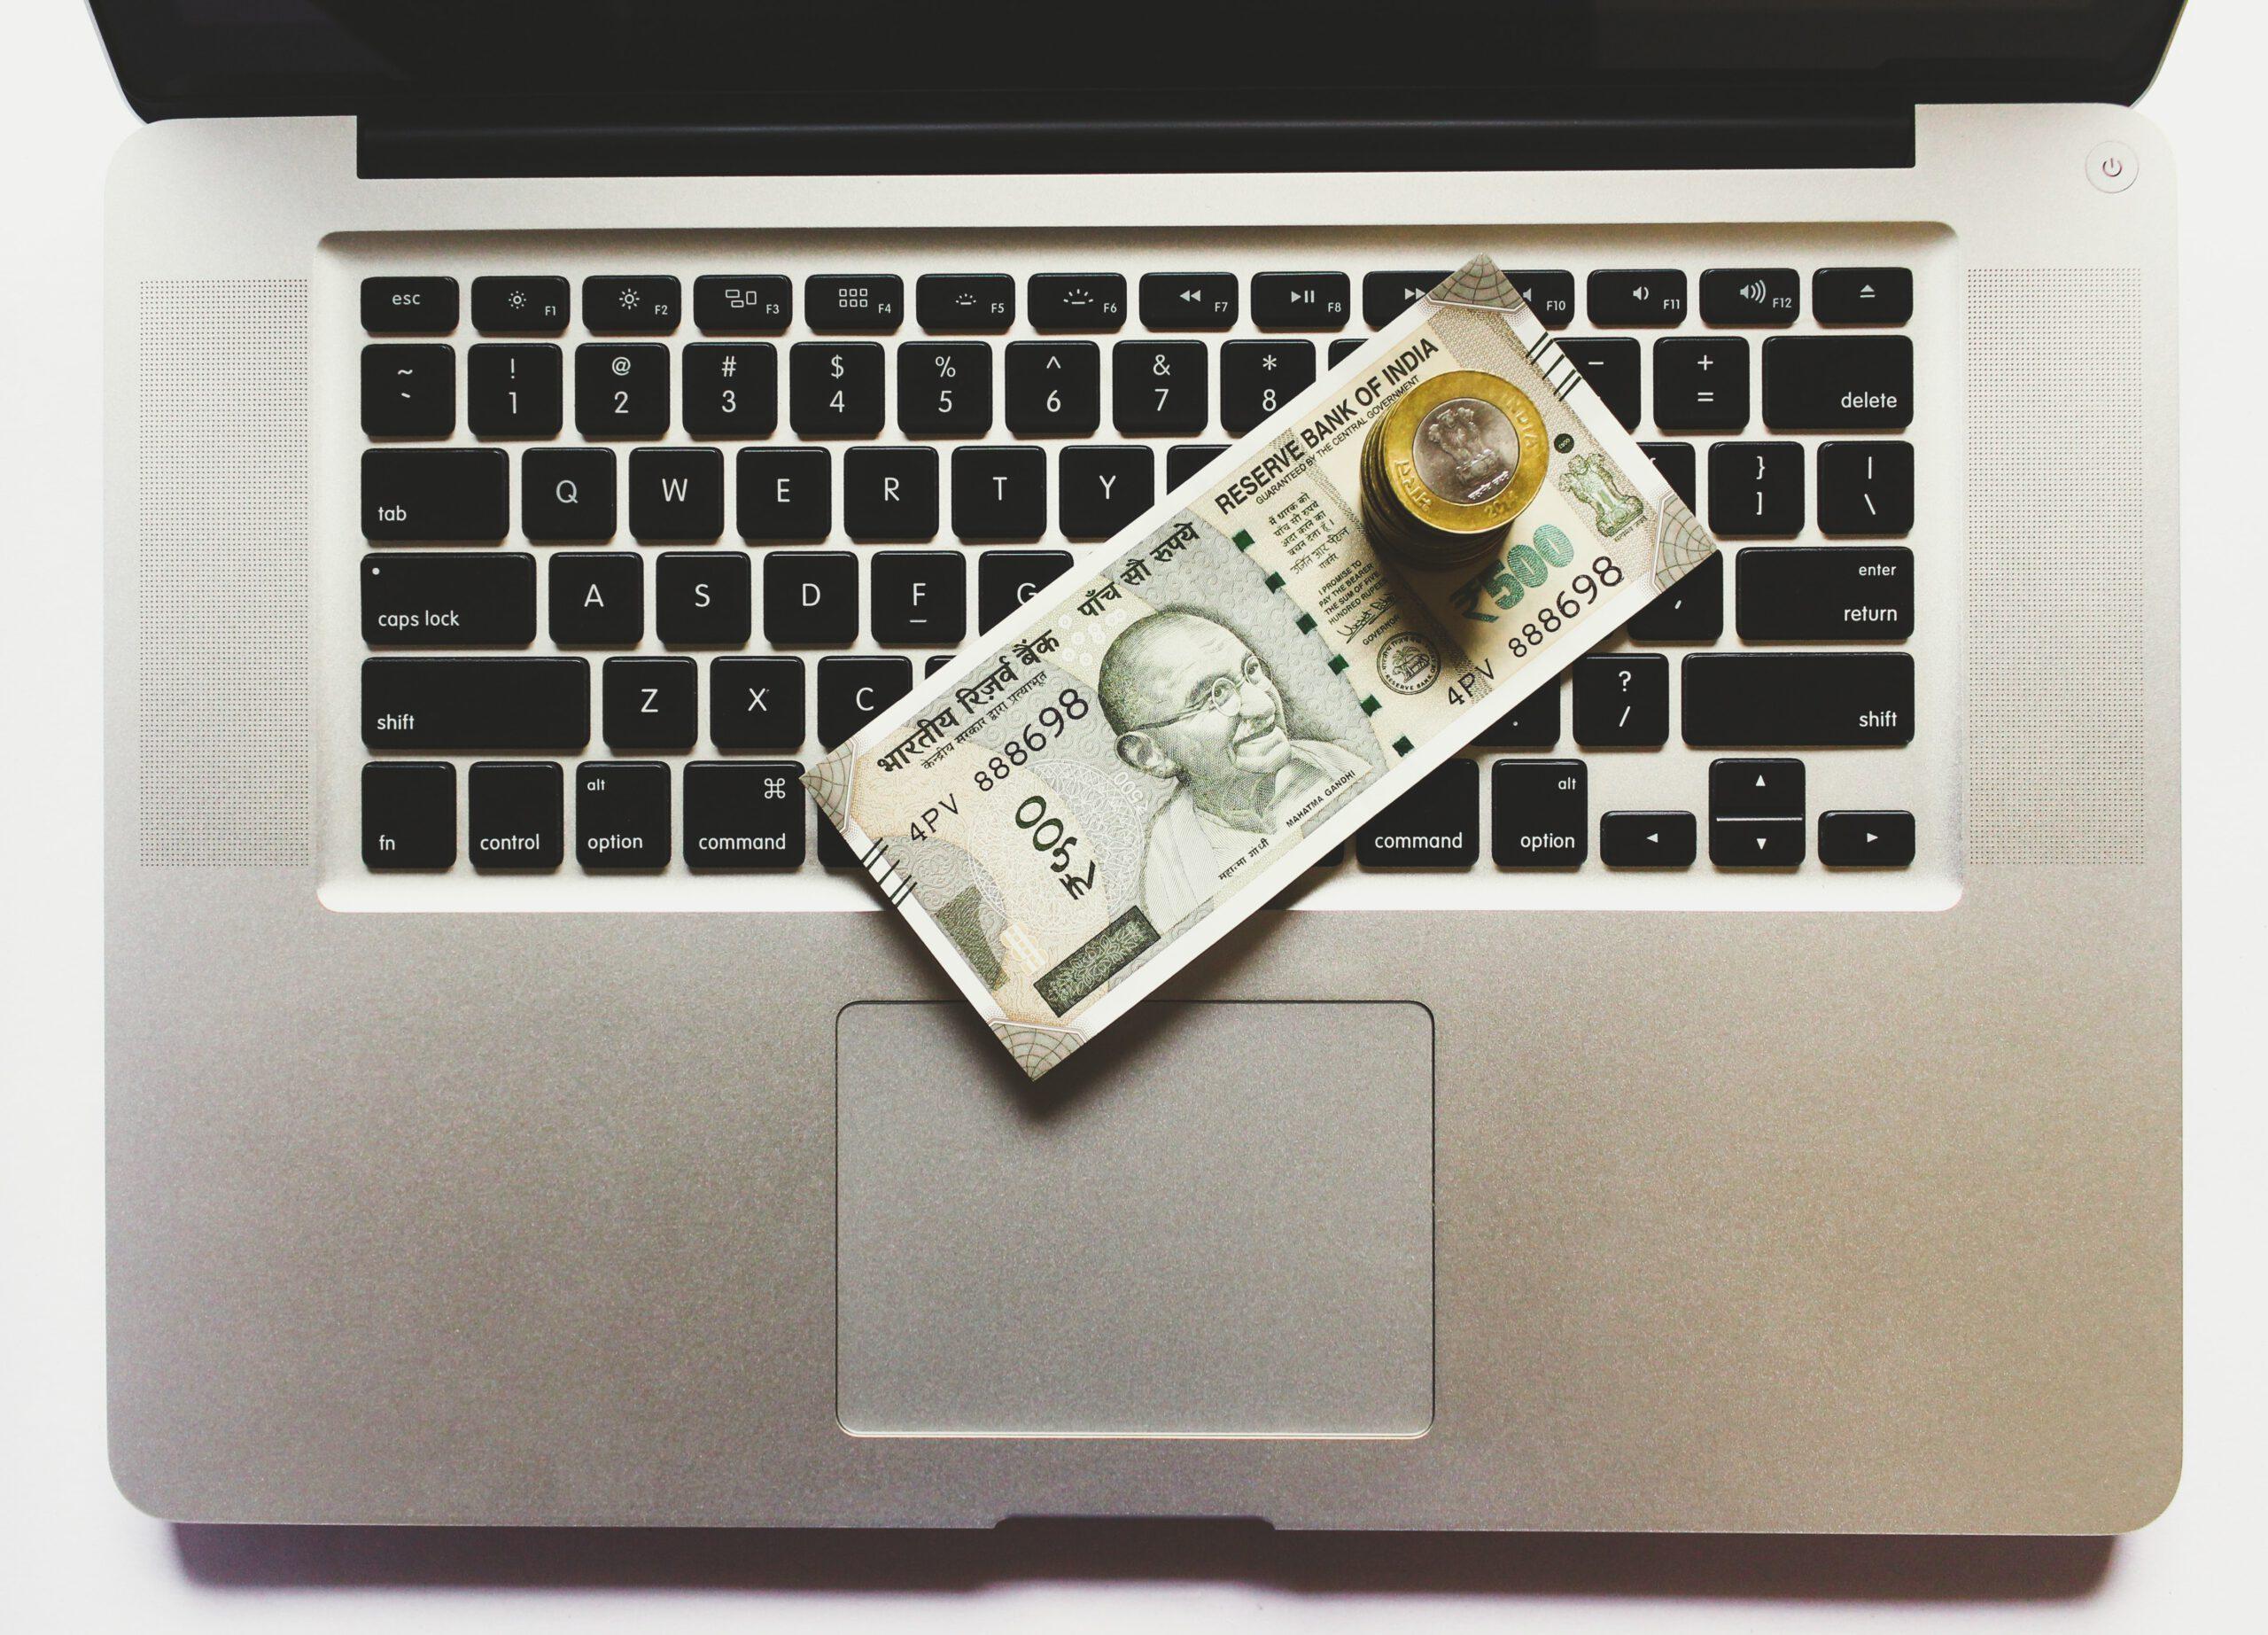 saving money on digital device when you do digital declutter